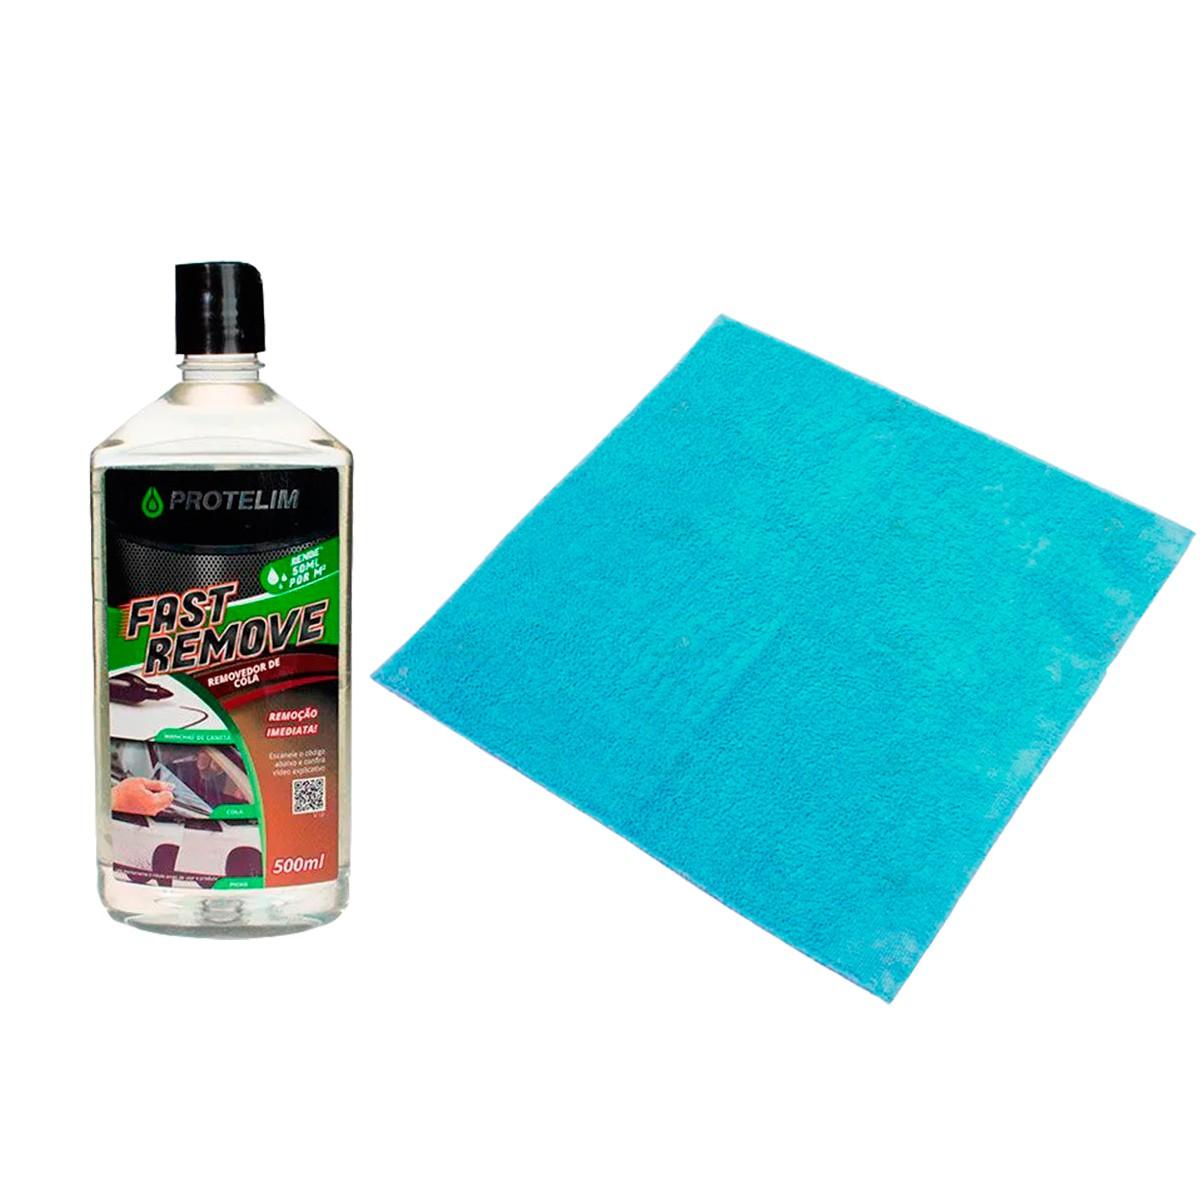 Kit Fast Remove 500ml Protelim + Flanela Microfibra Mandala